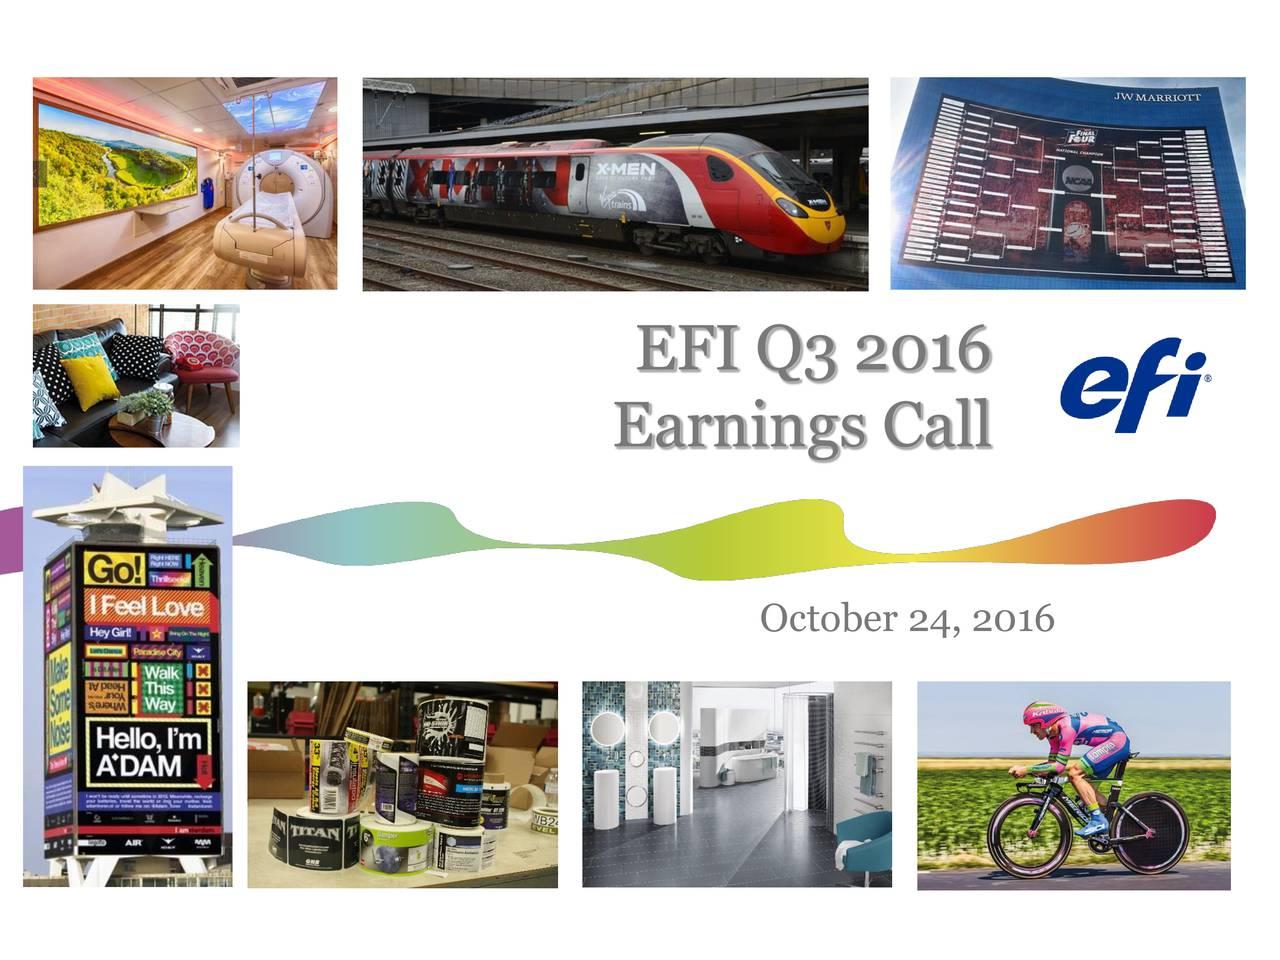 Earnings Call October 24, 2016